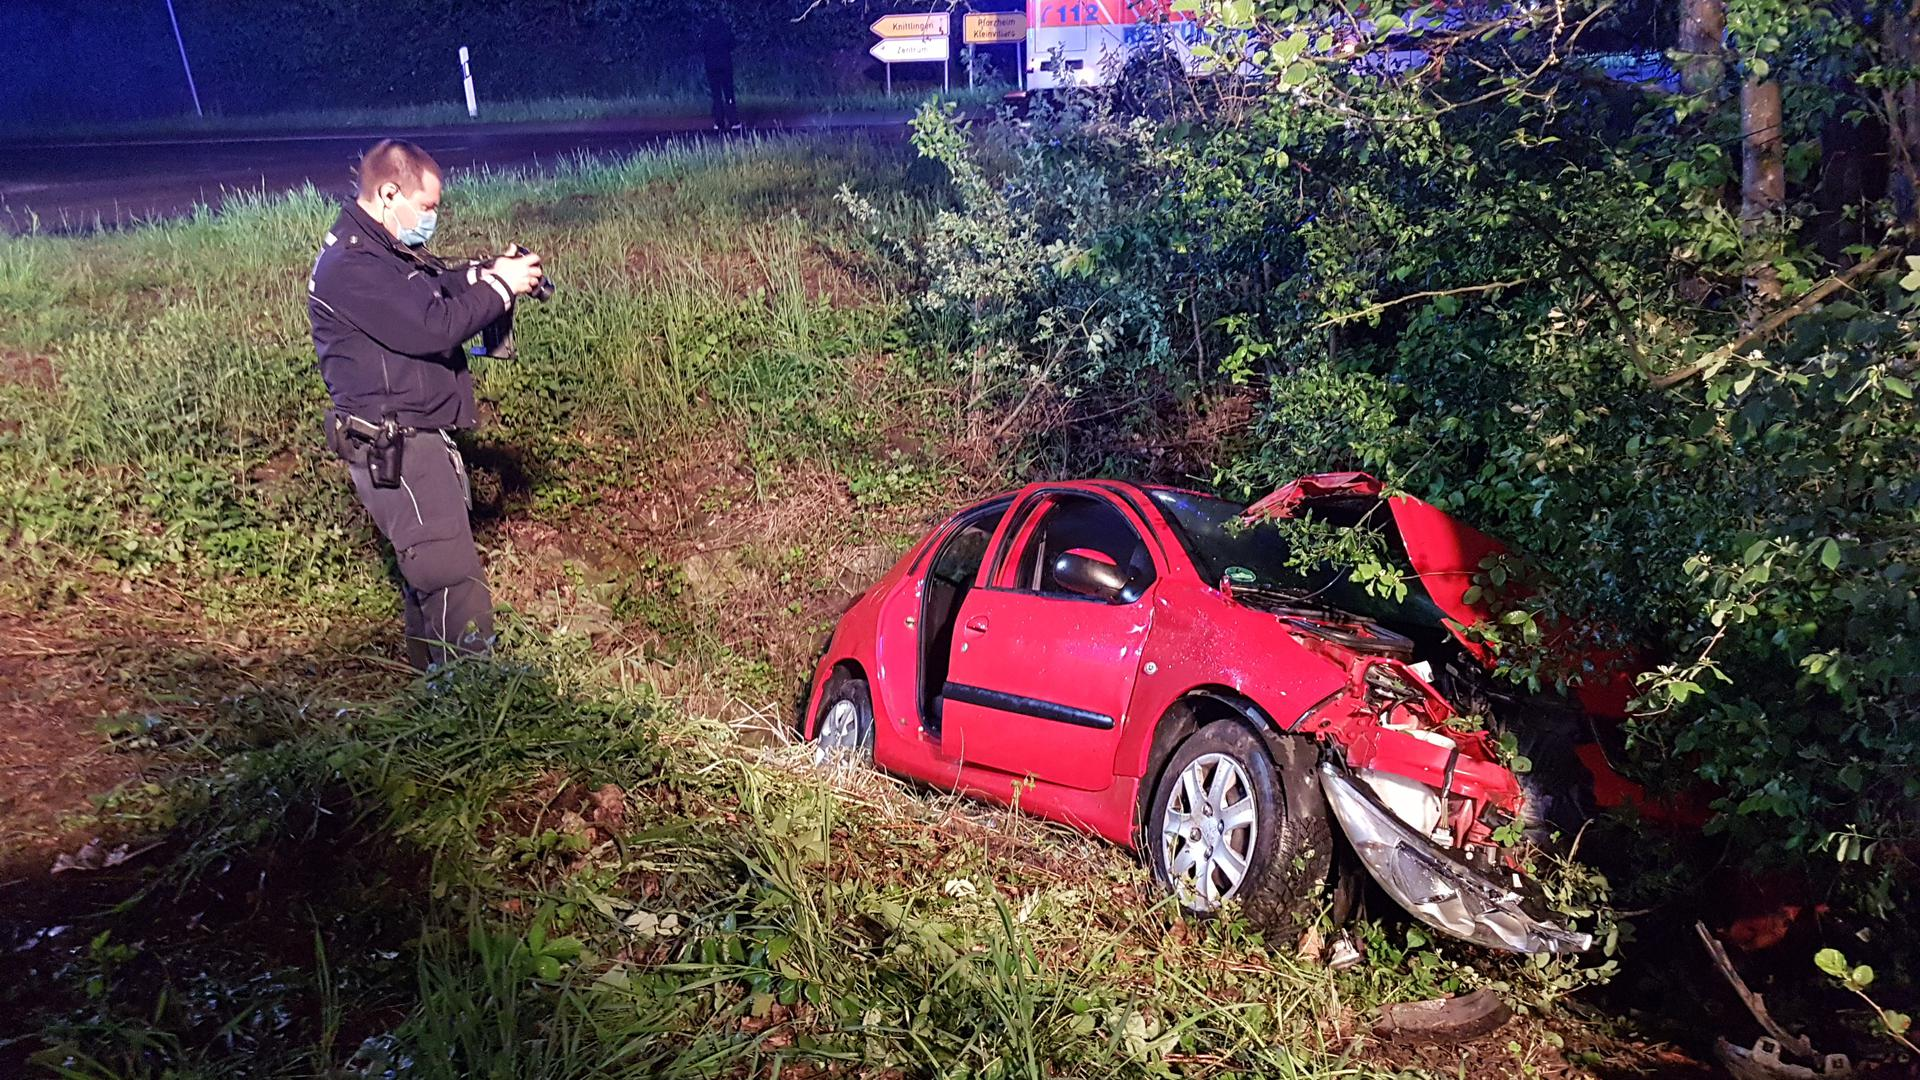 Polizei fotografiert Unfallfahrzeug